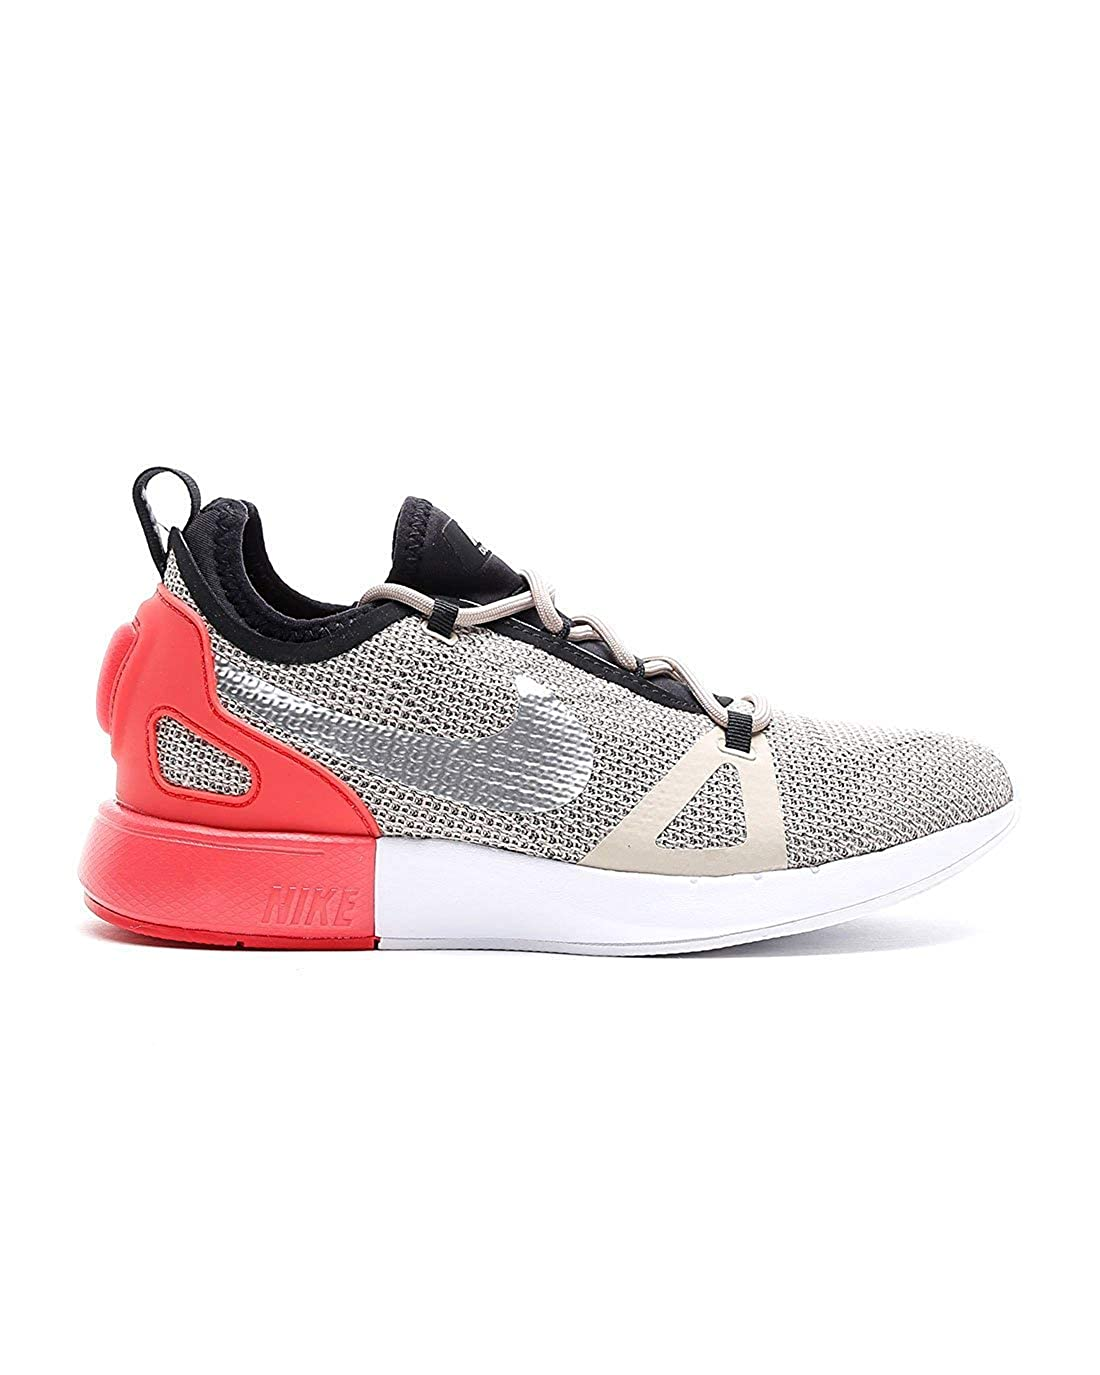 Stbague Chrome blanc 201 40 EU Nike , paniers pour femme